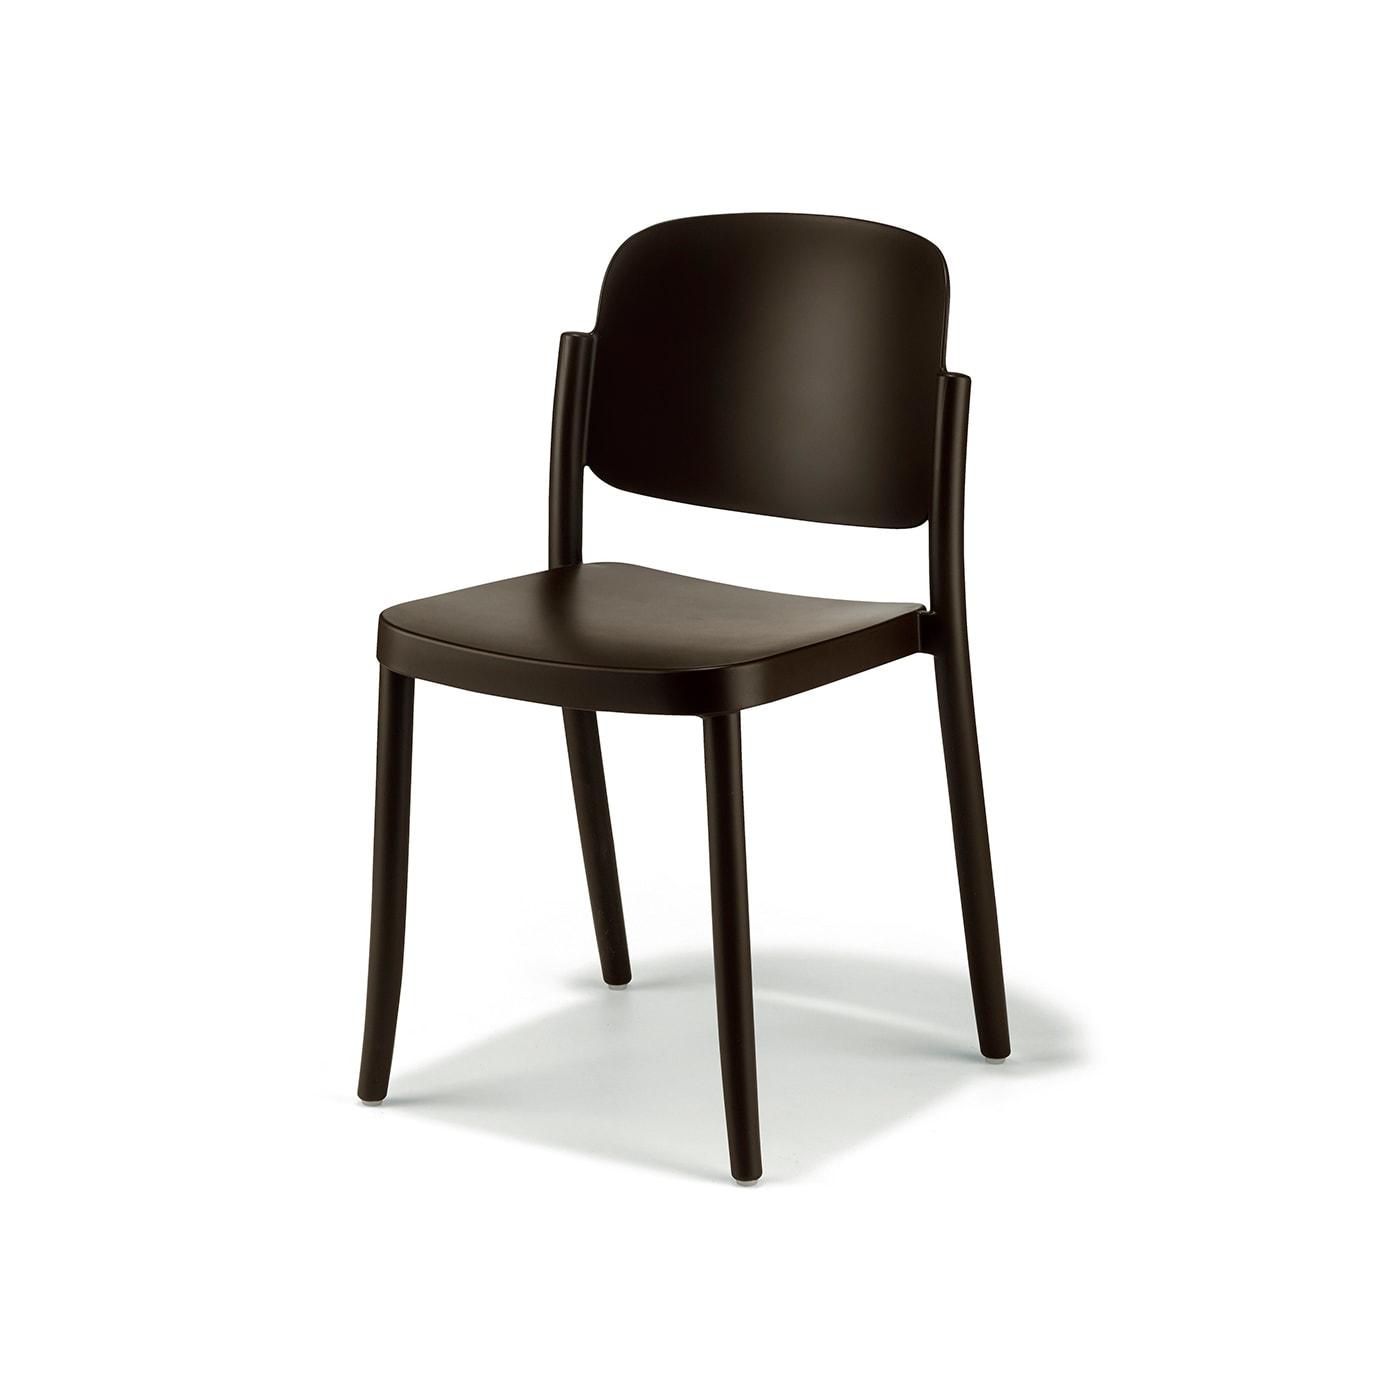 COLOS Piazza sedia impilabile